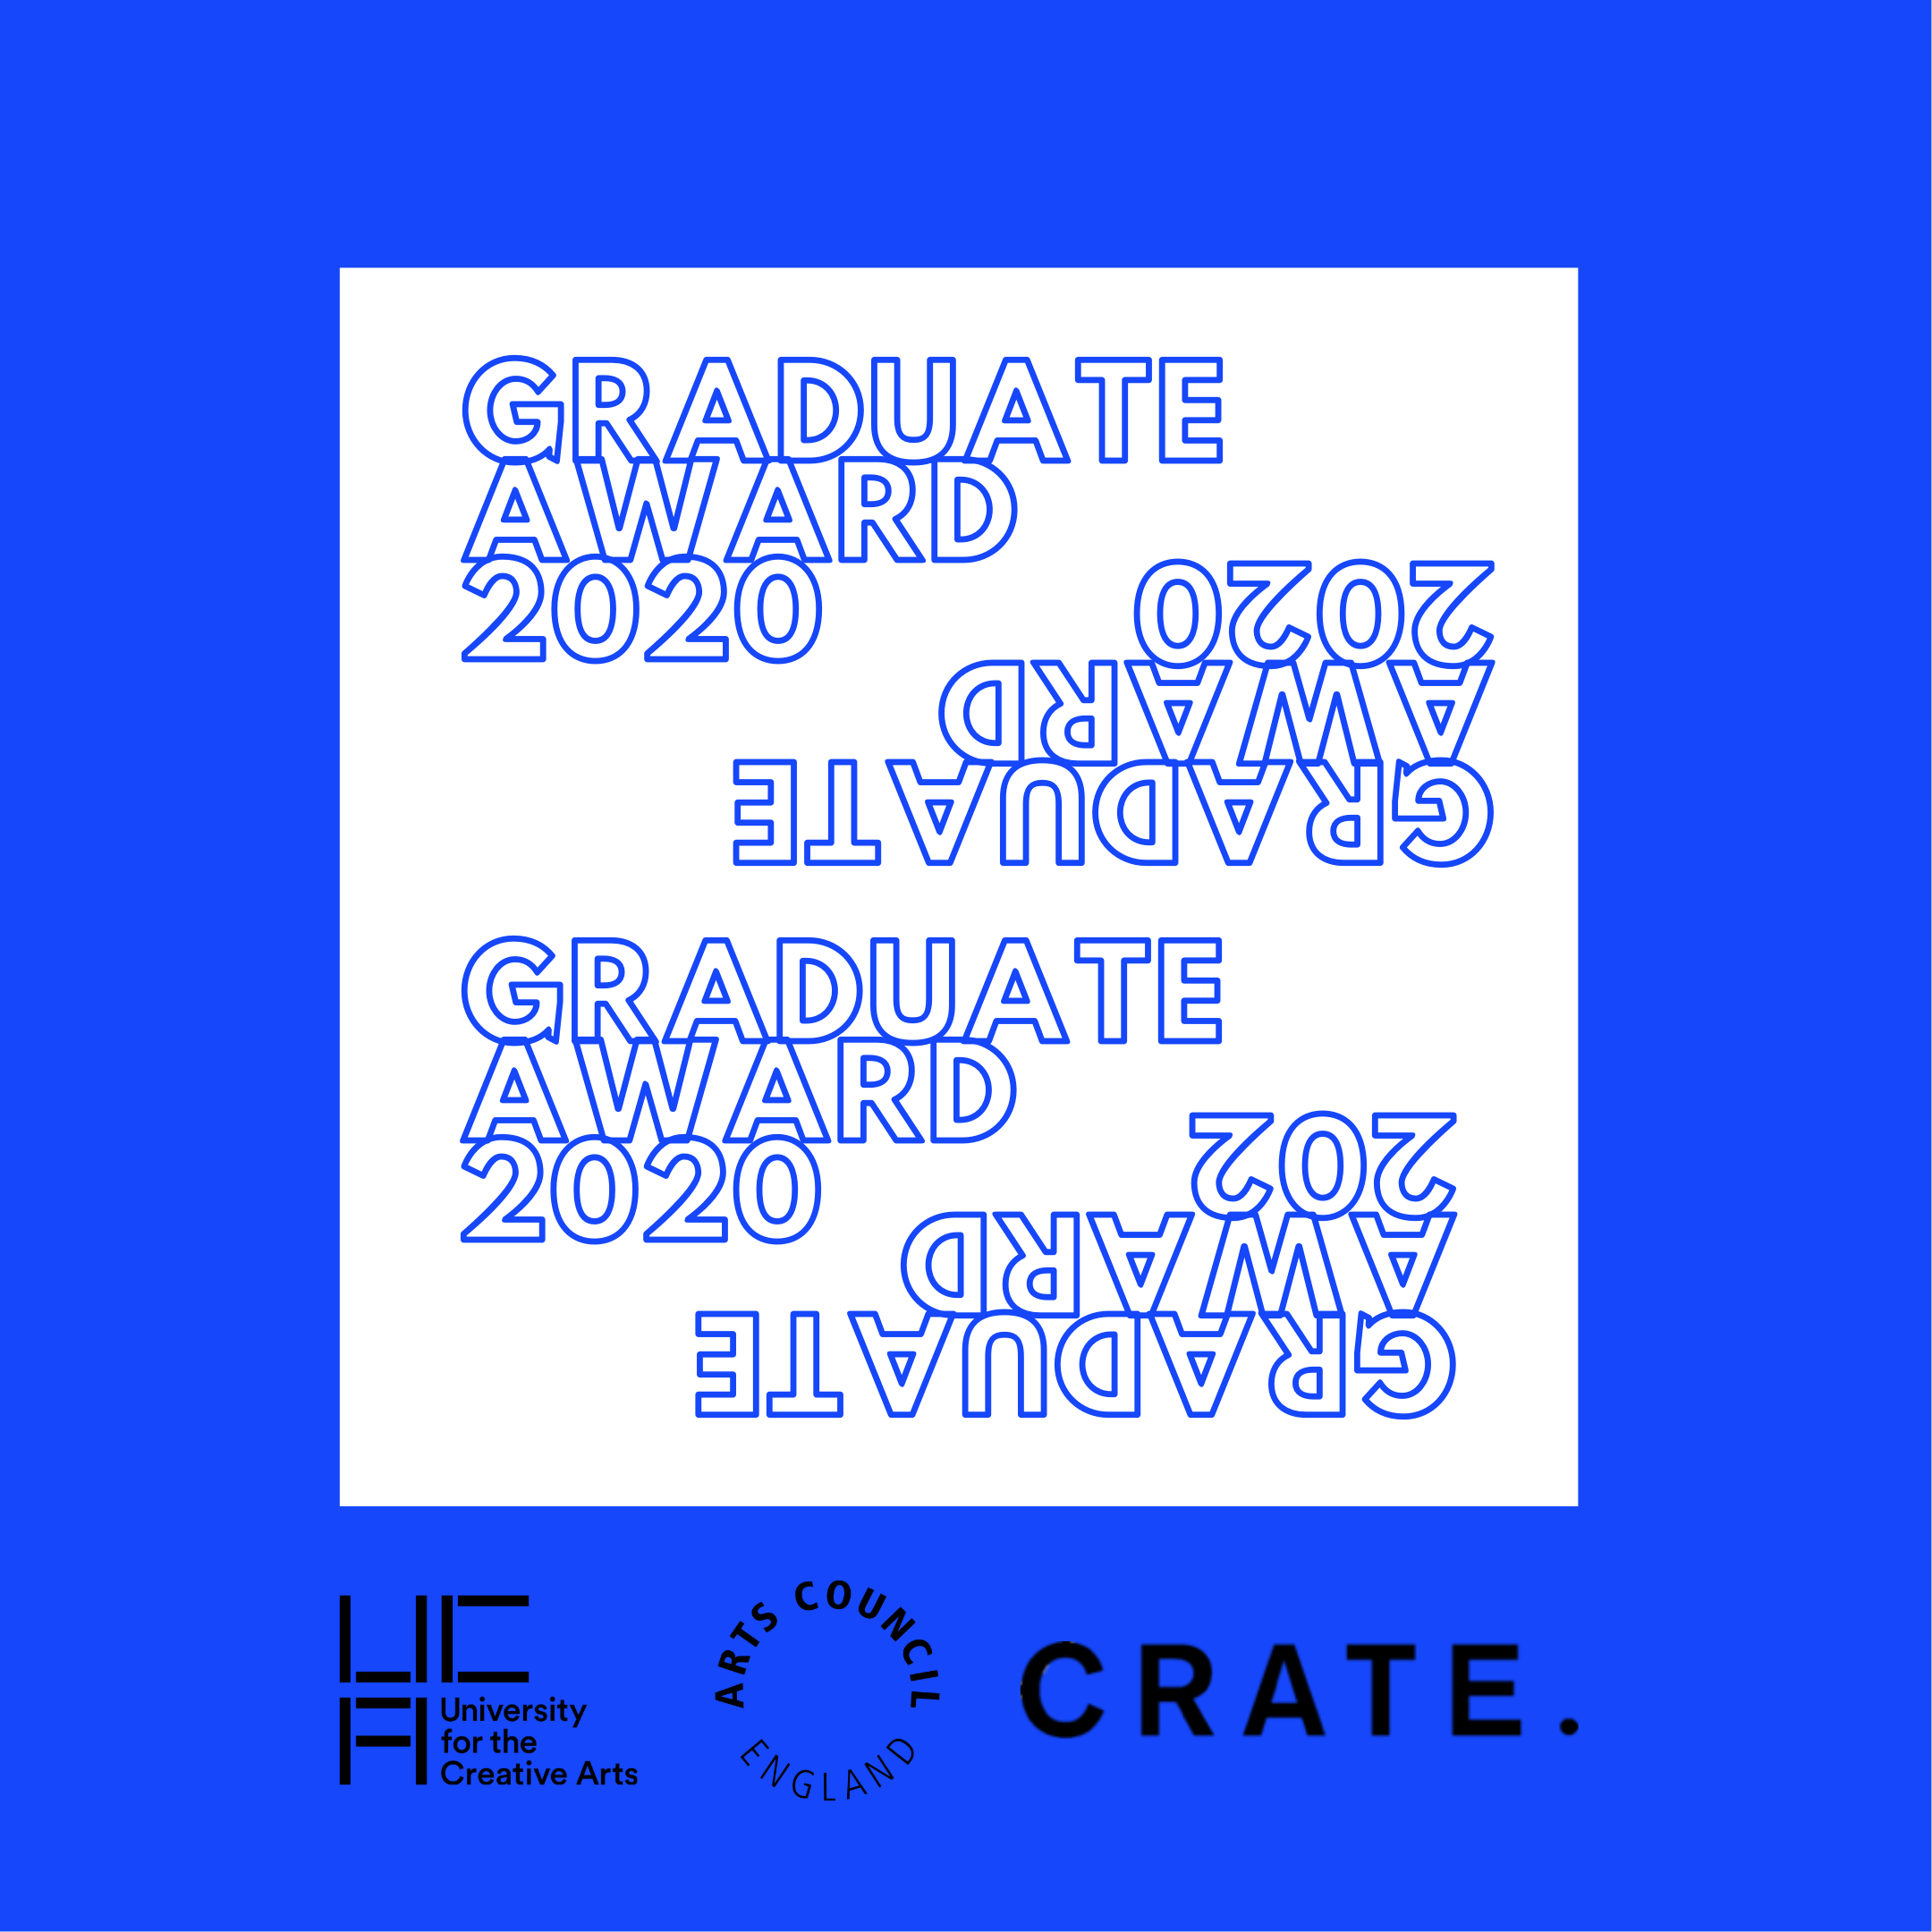 crate-grad-award-2020